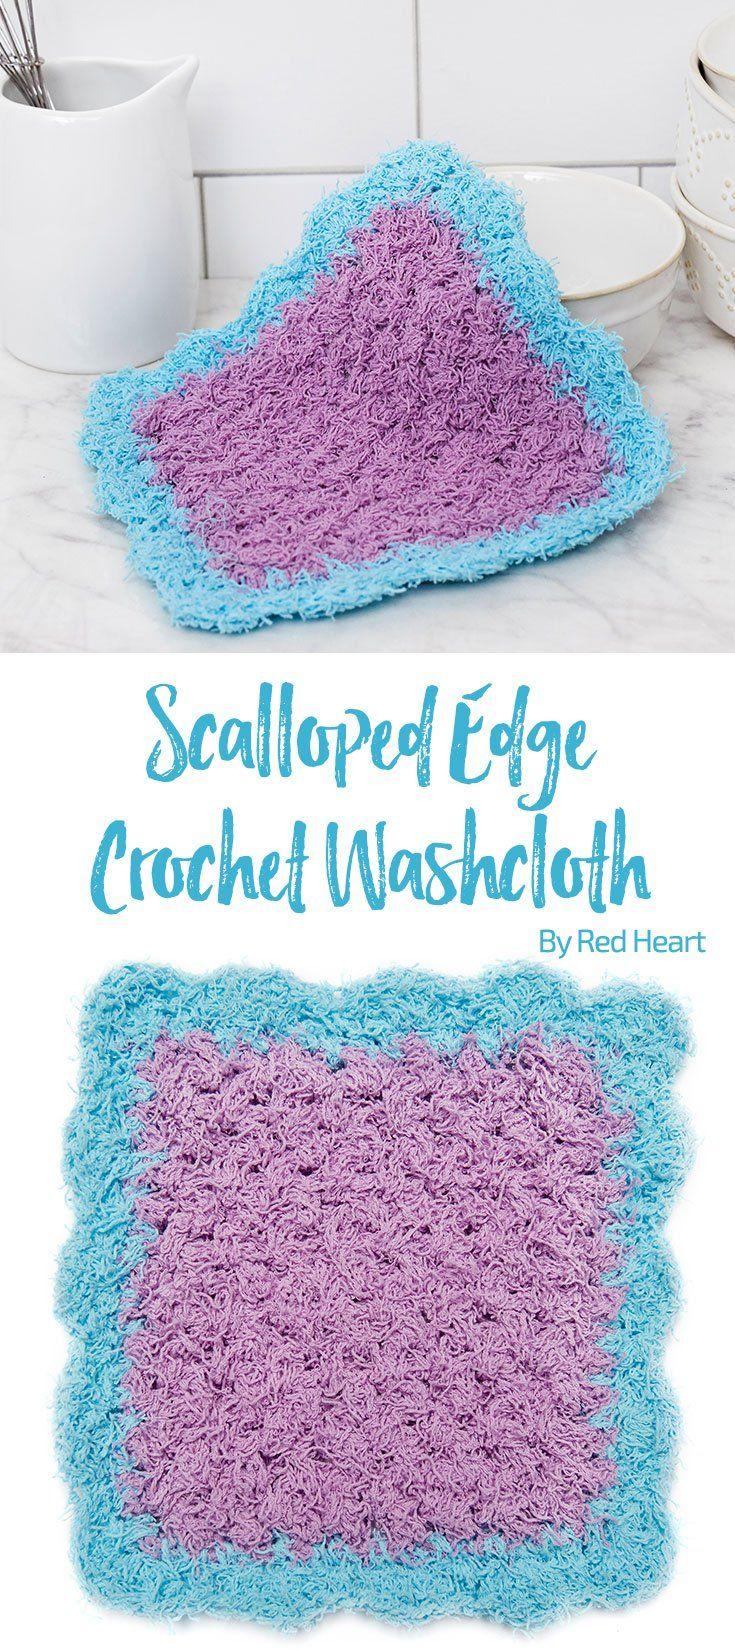 Scalloped Edge Crochet Washcloth free crochet pattern in Scrubby ...